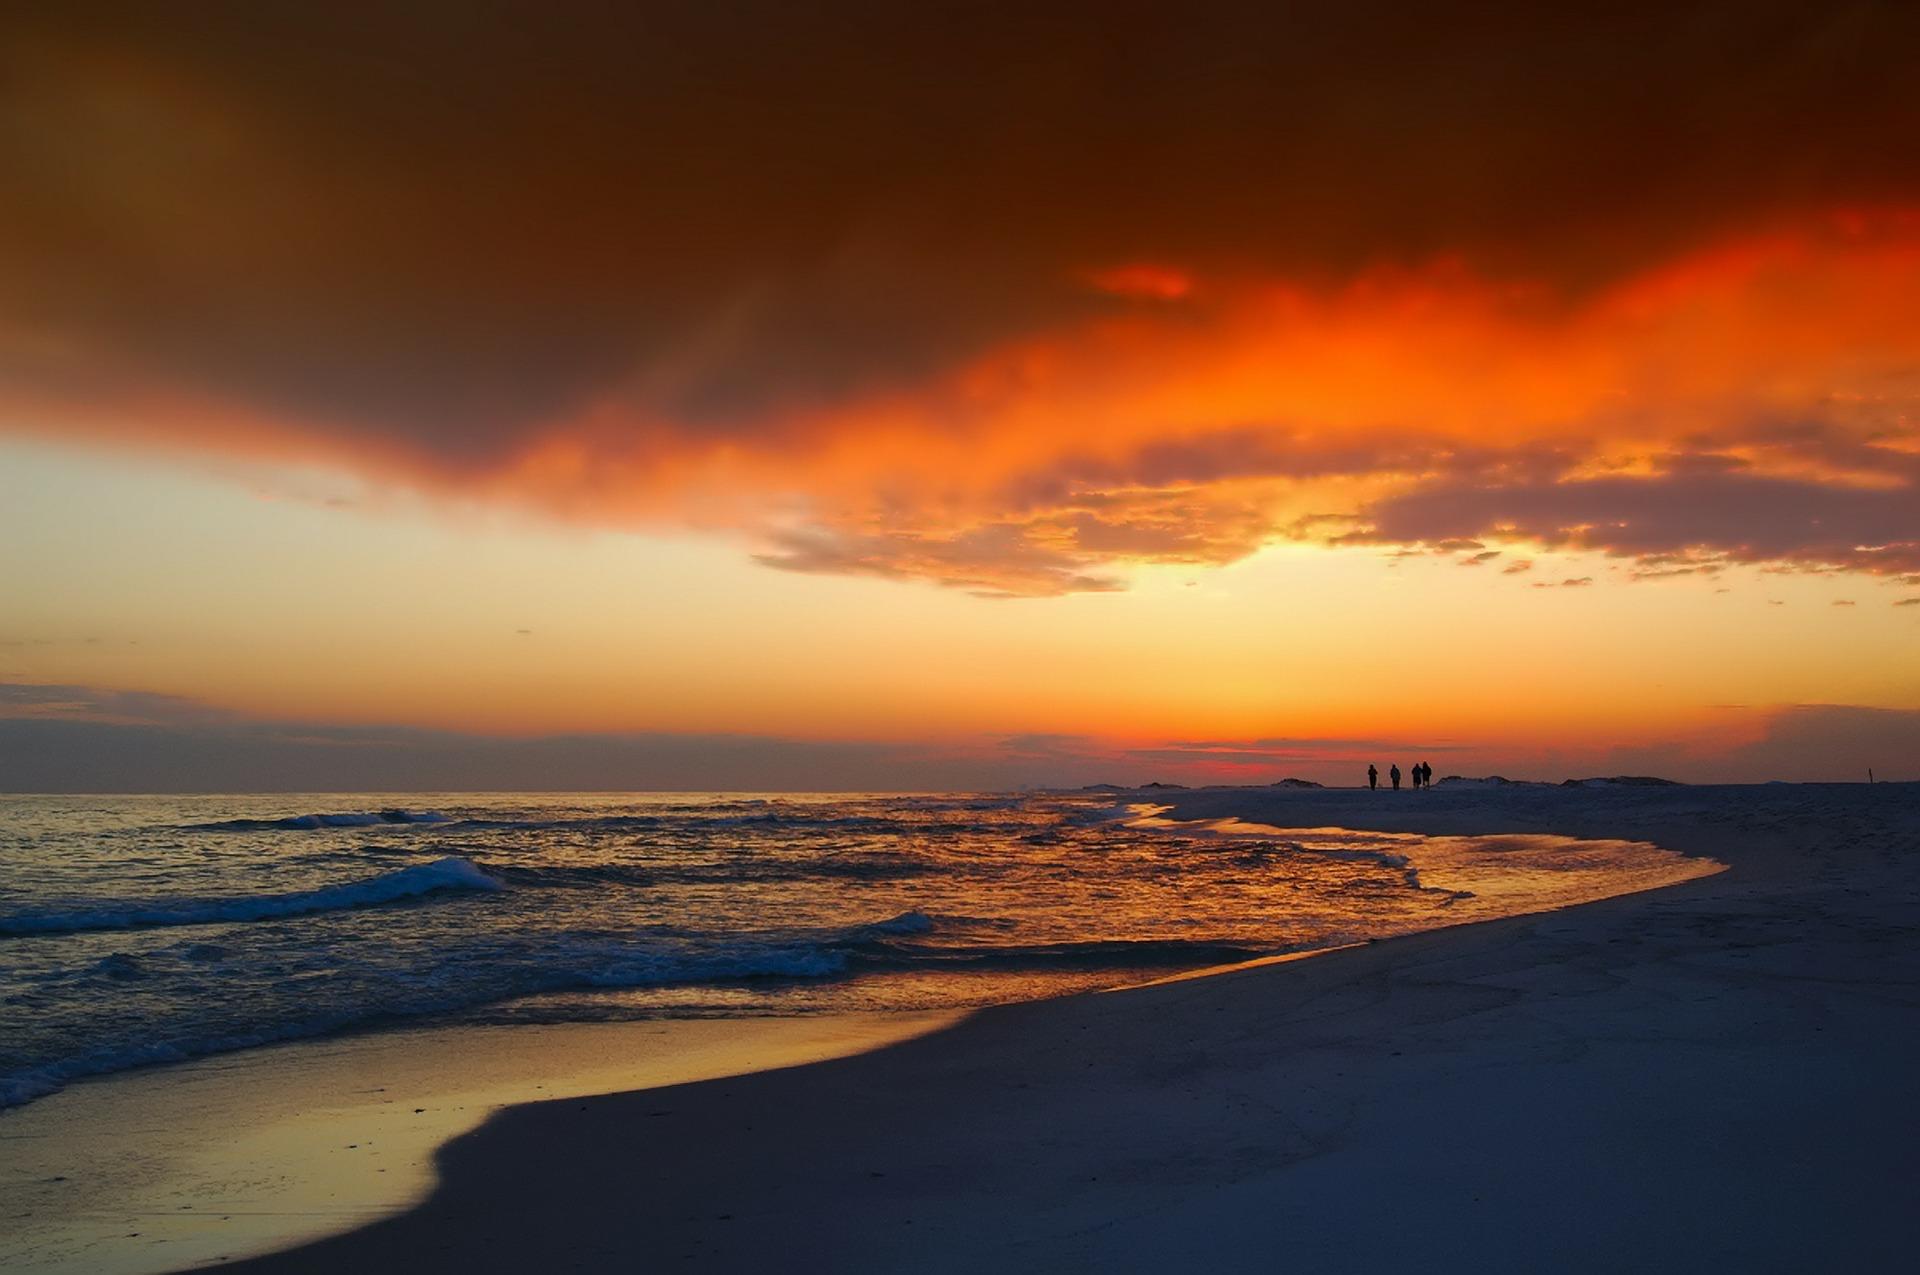 KETAMINE CLINIC IN FLORIDA